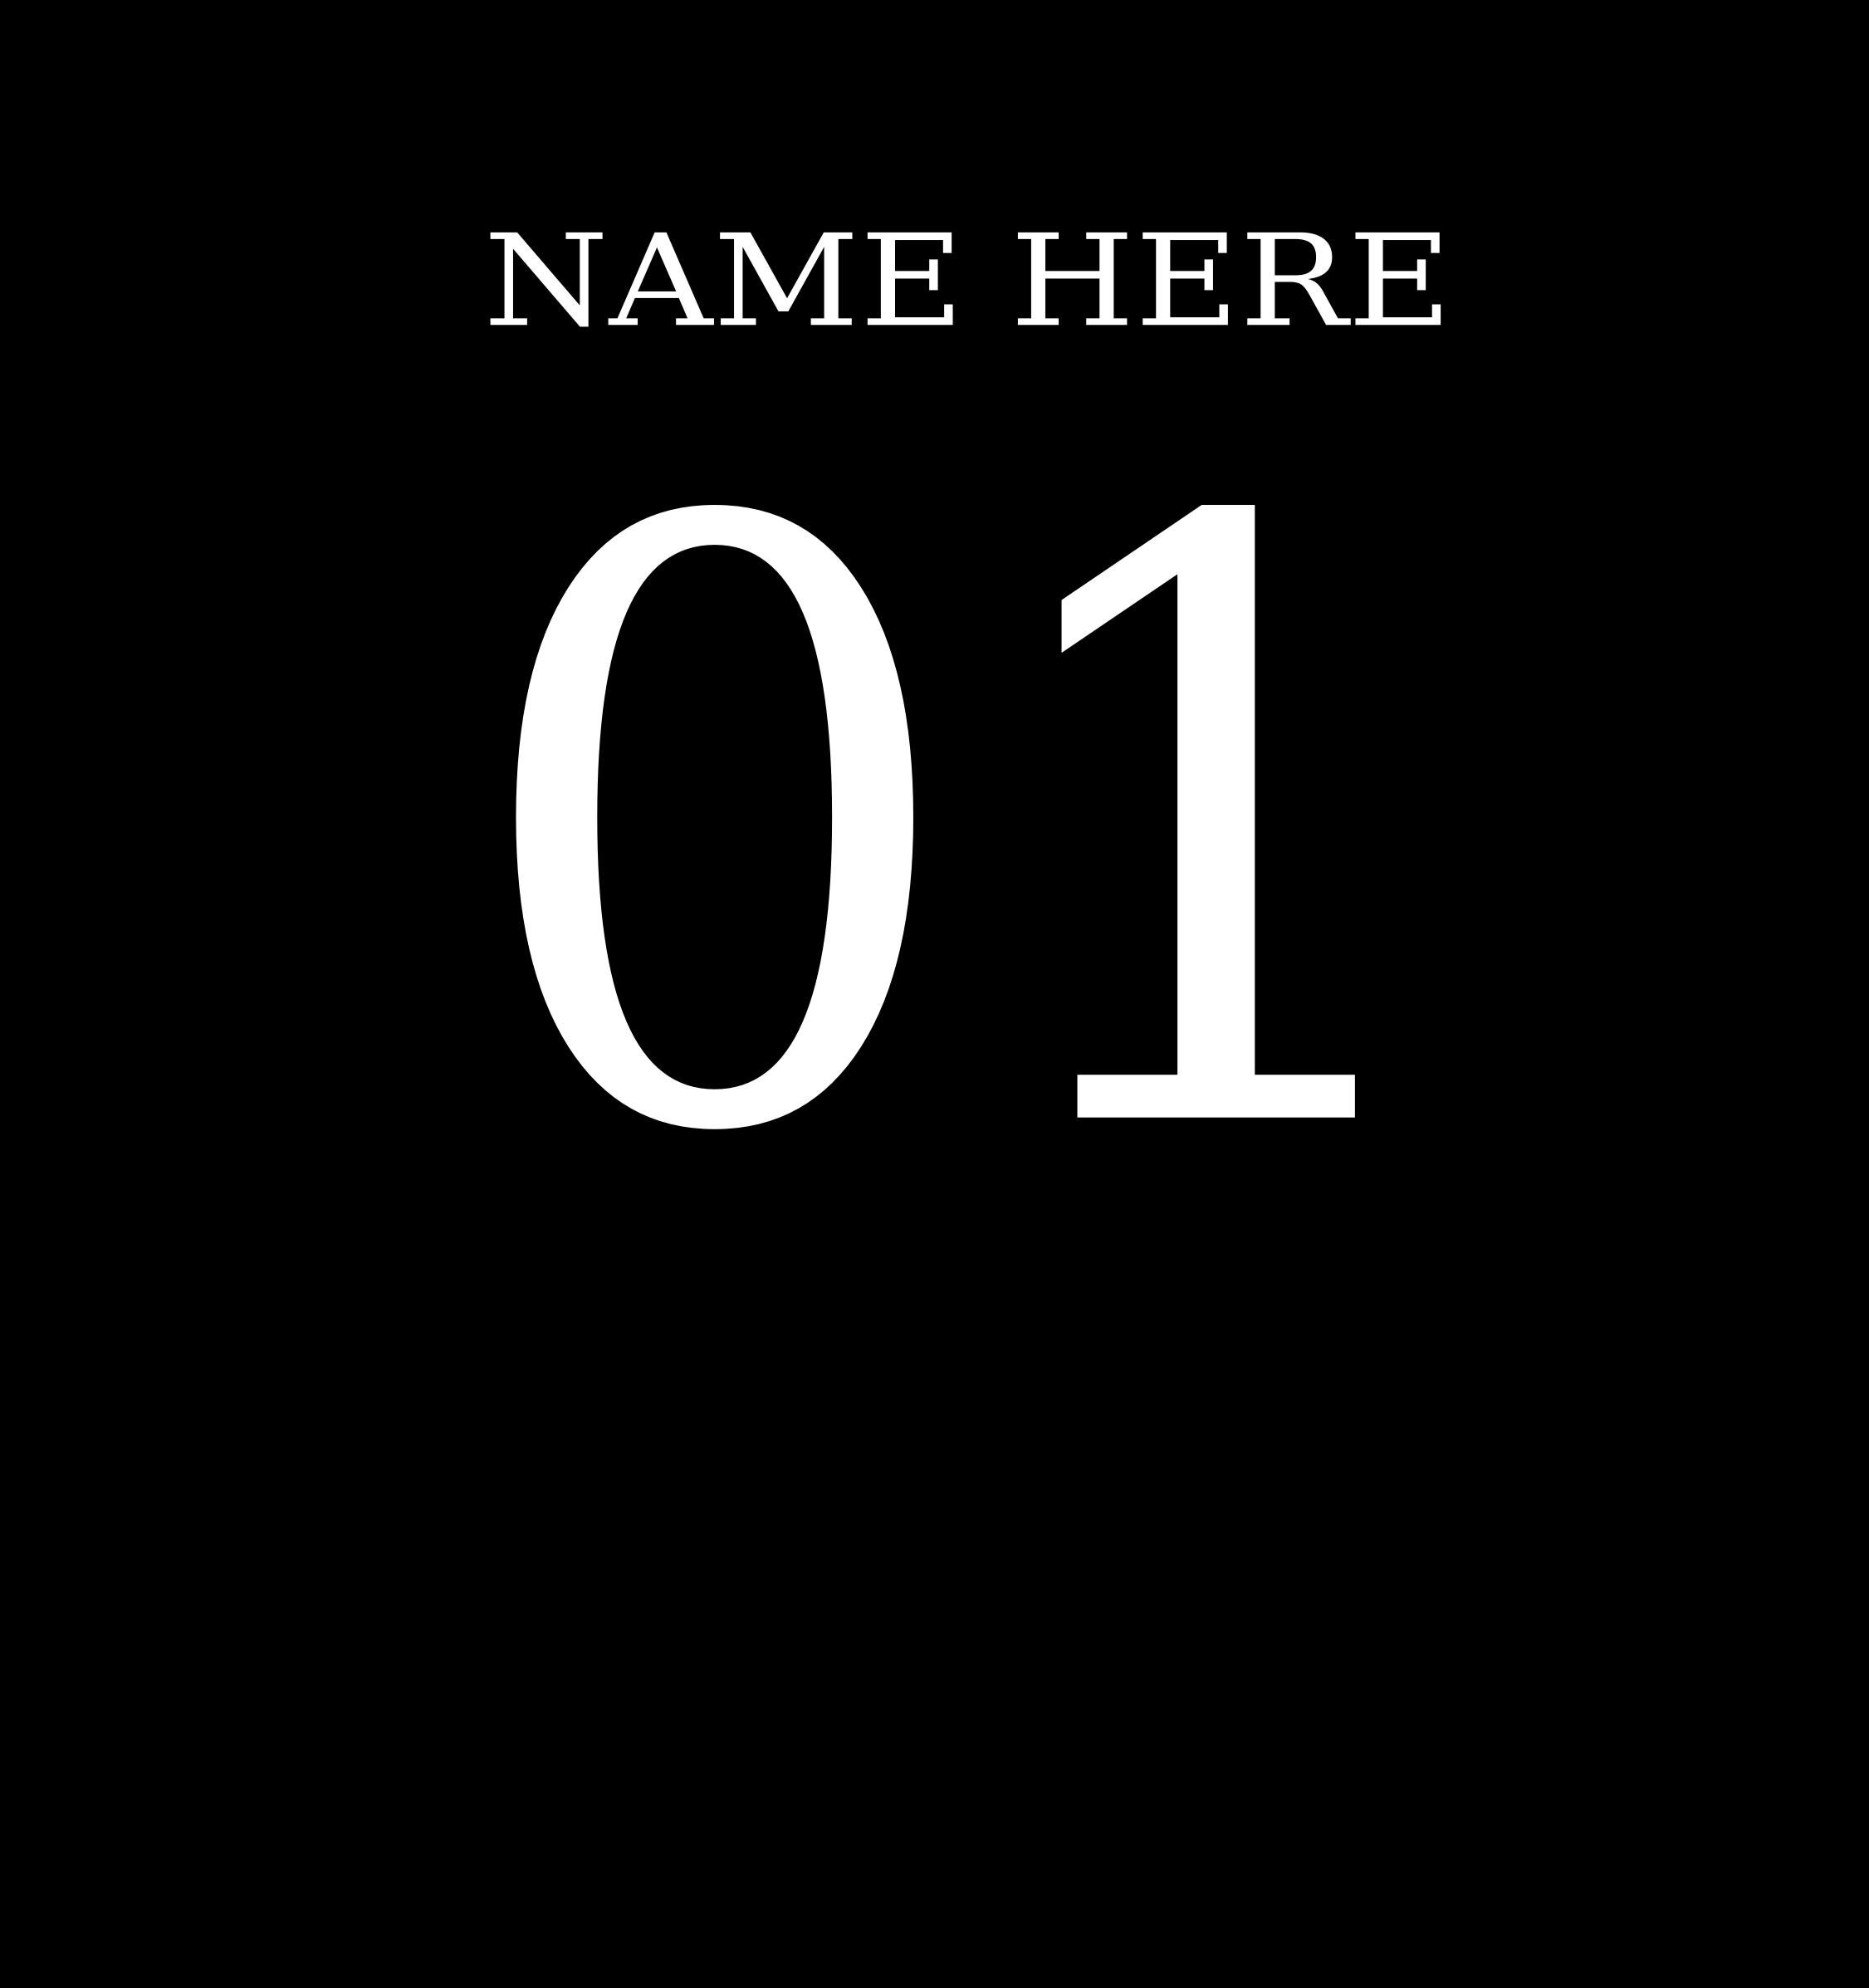 T shirt big image. Name clipart number